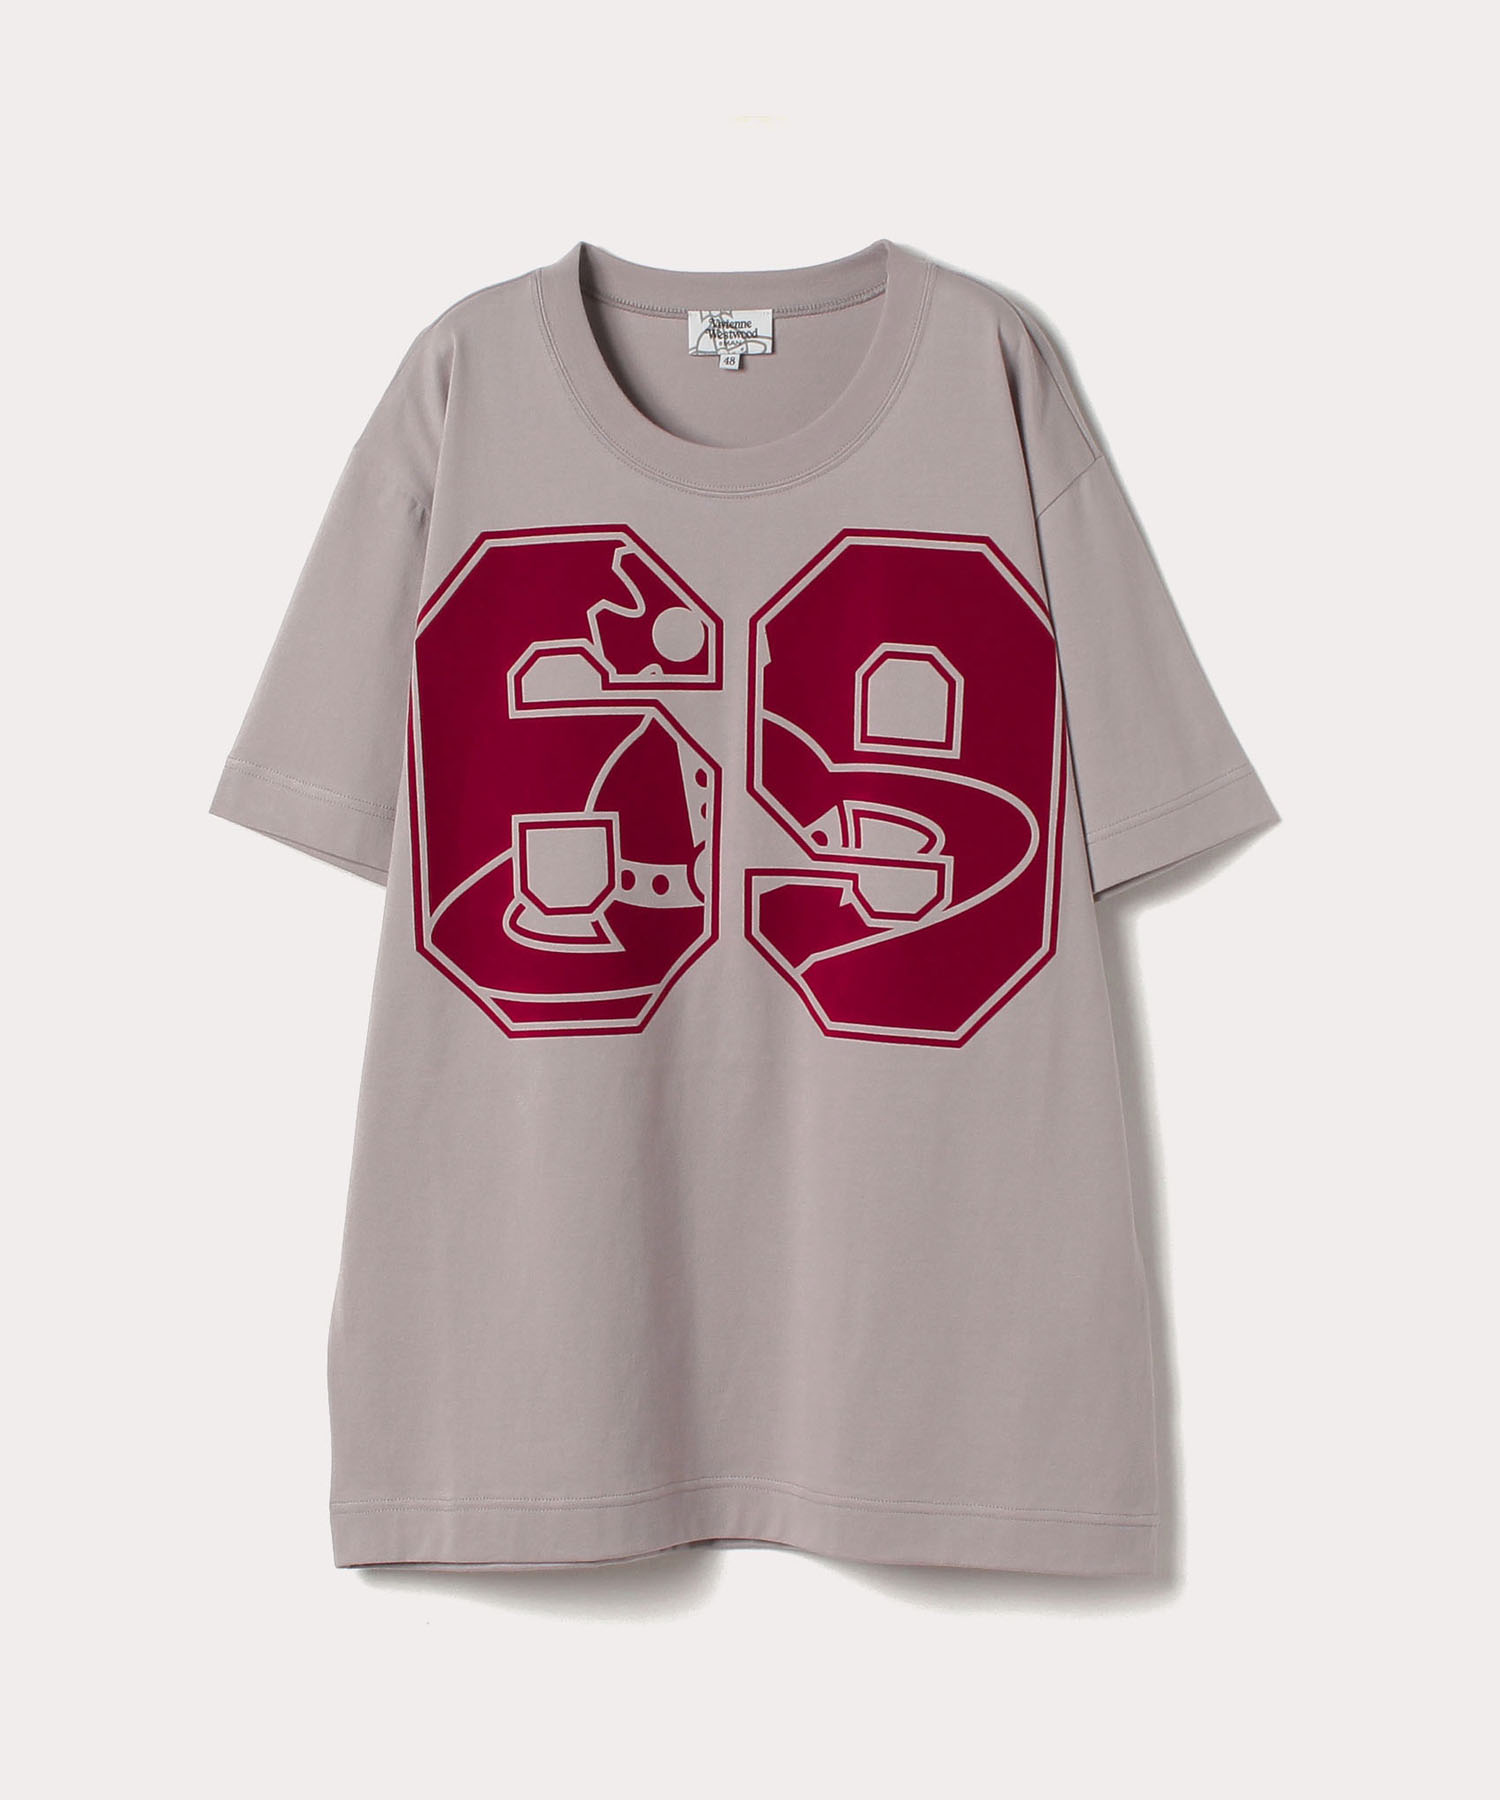 ORB 69 リラックス半袖Tシャツ